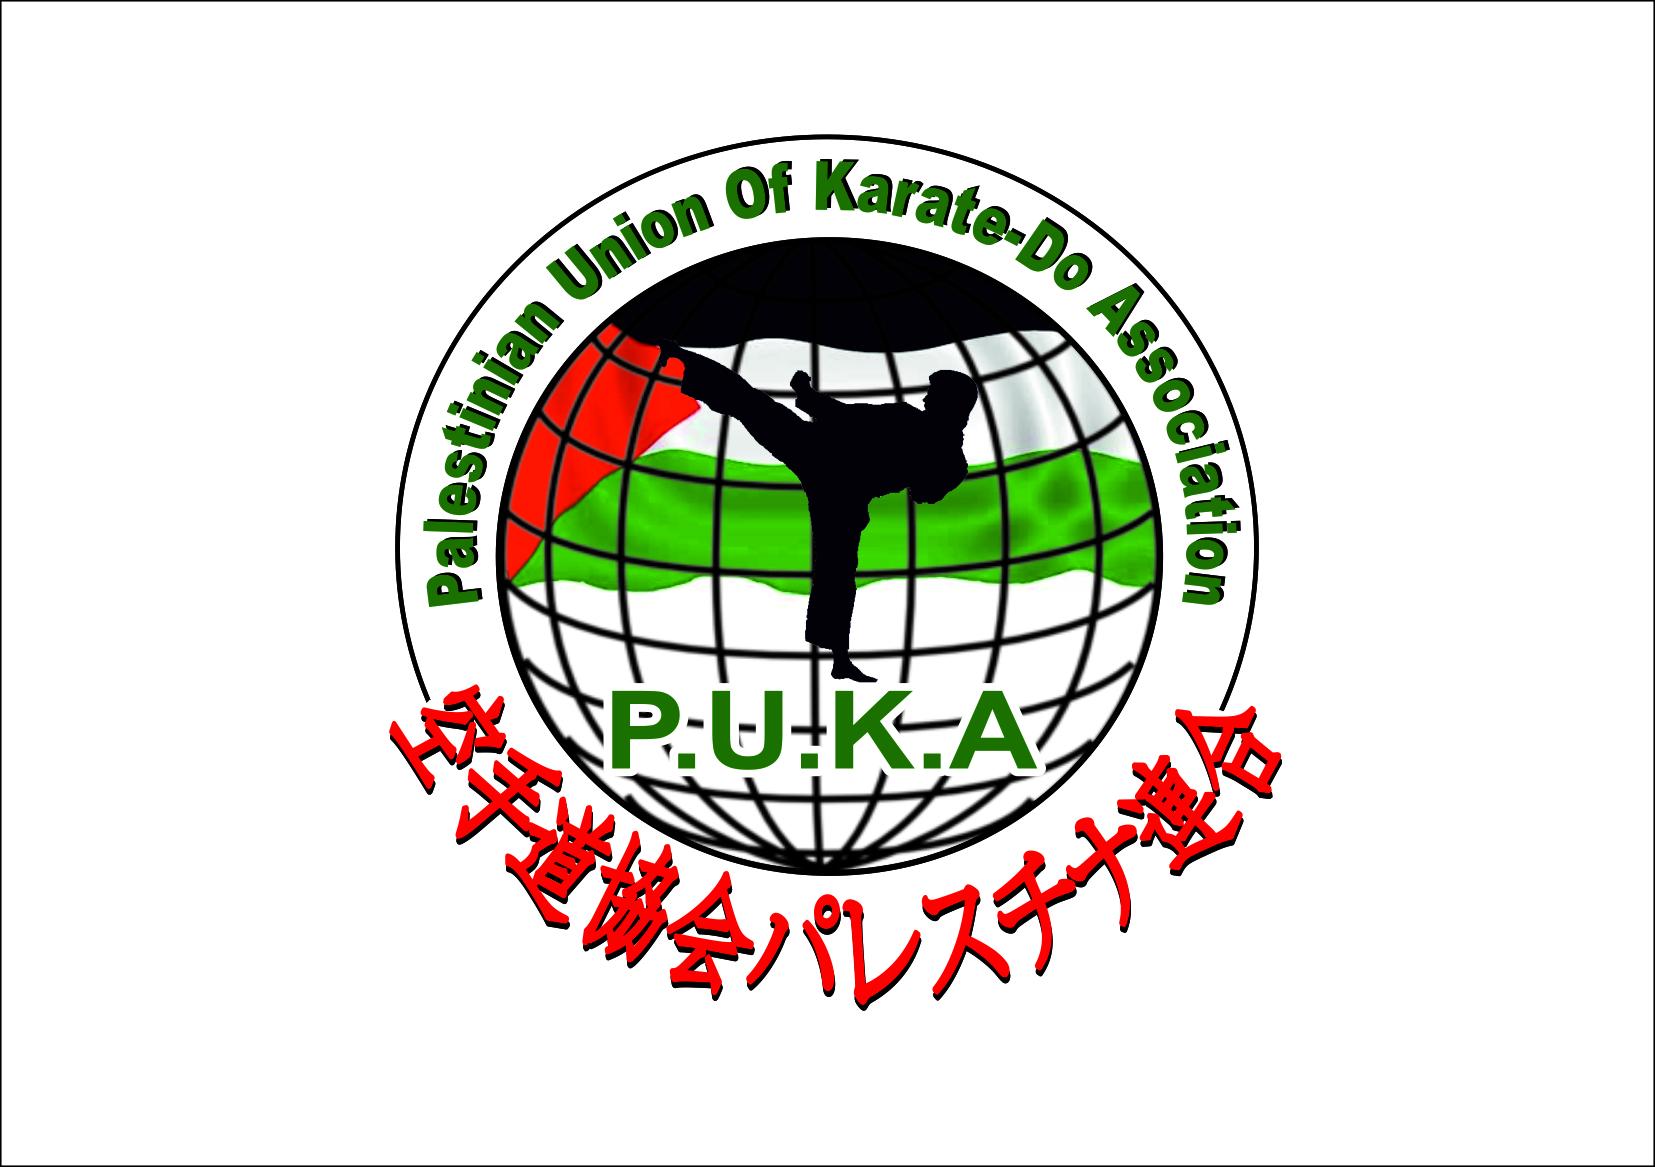 Palestinian Karate Association